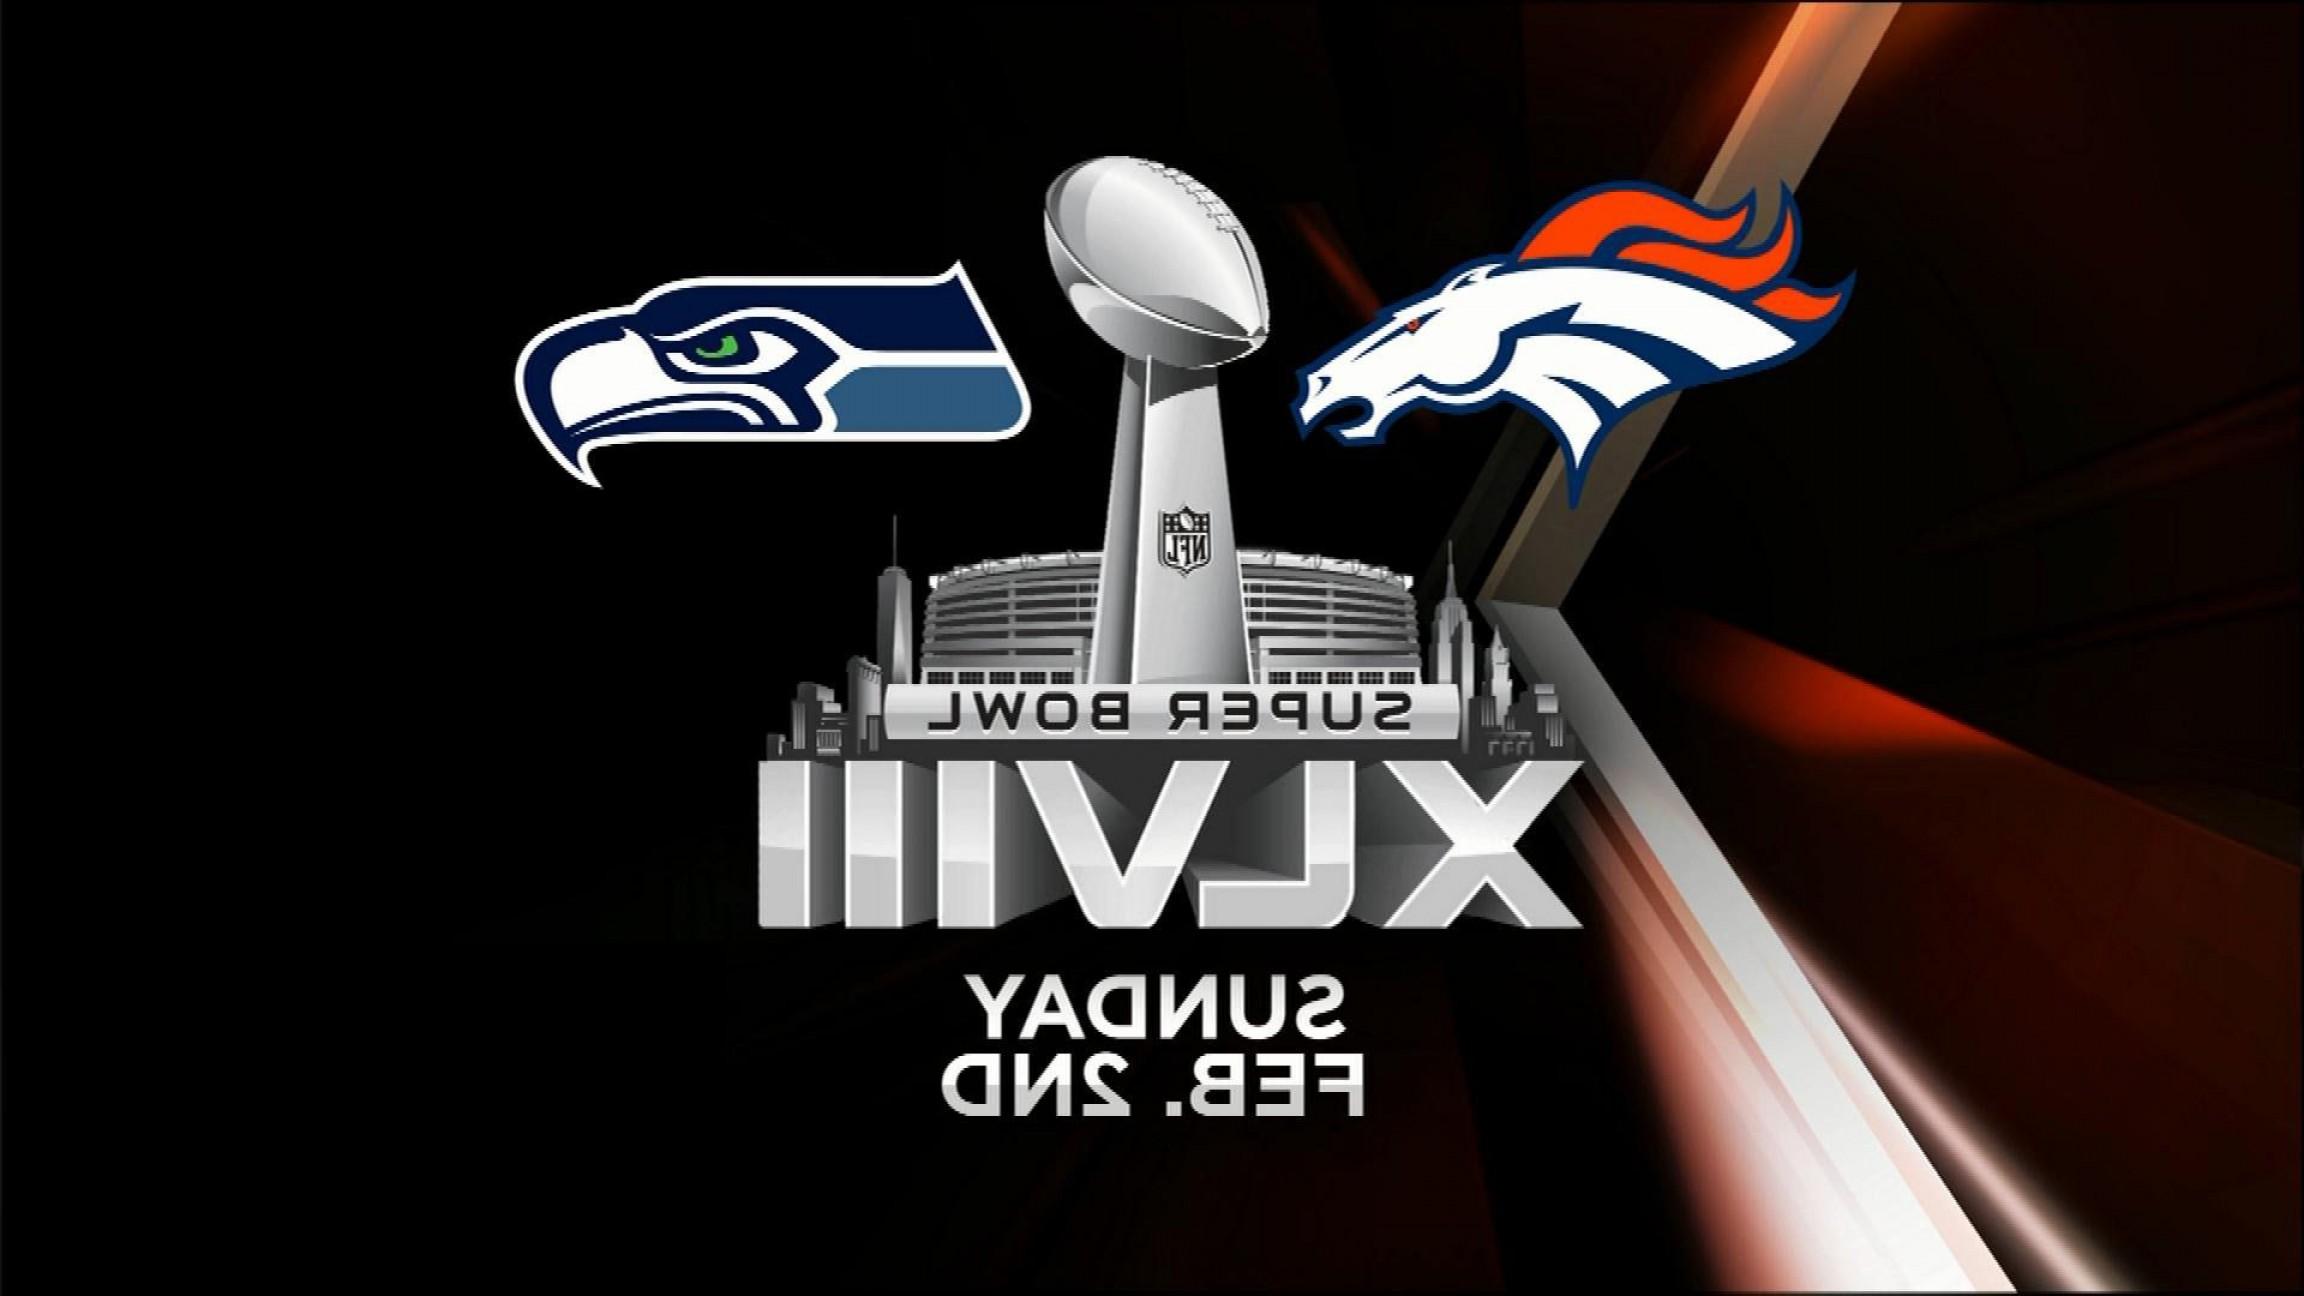 2304x1296 Super Bowl 2014 Logo Vector Shopatcloth